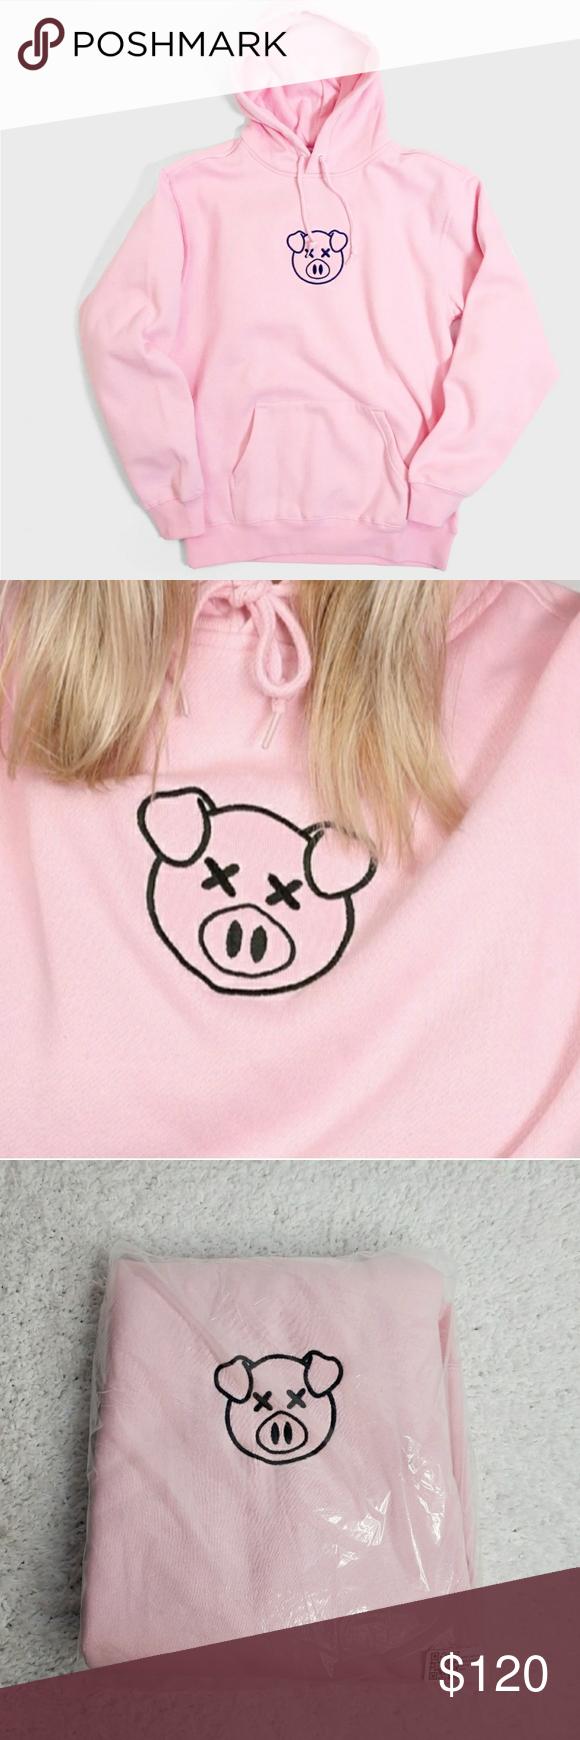 Authentic Shane Dawson Embroidered Pig Logo Hoodie Authentic Shane Dawson Embroidered Pig Logo Hoodie New S Cotton Pullover Sweatshirts Hoodie Sweatshirt Tops